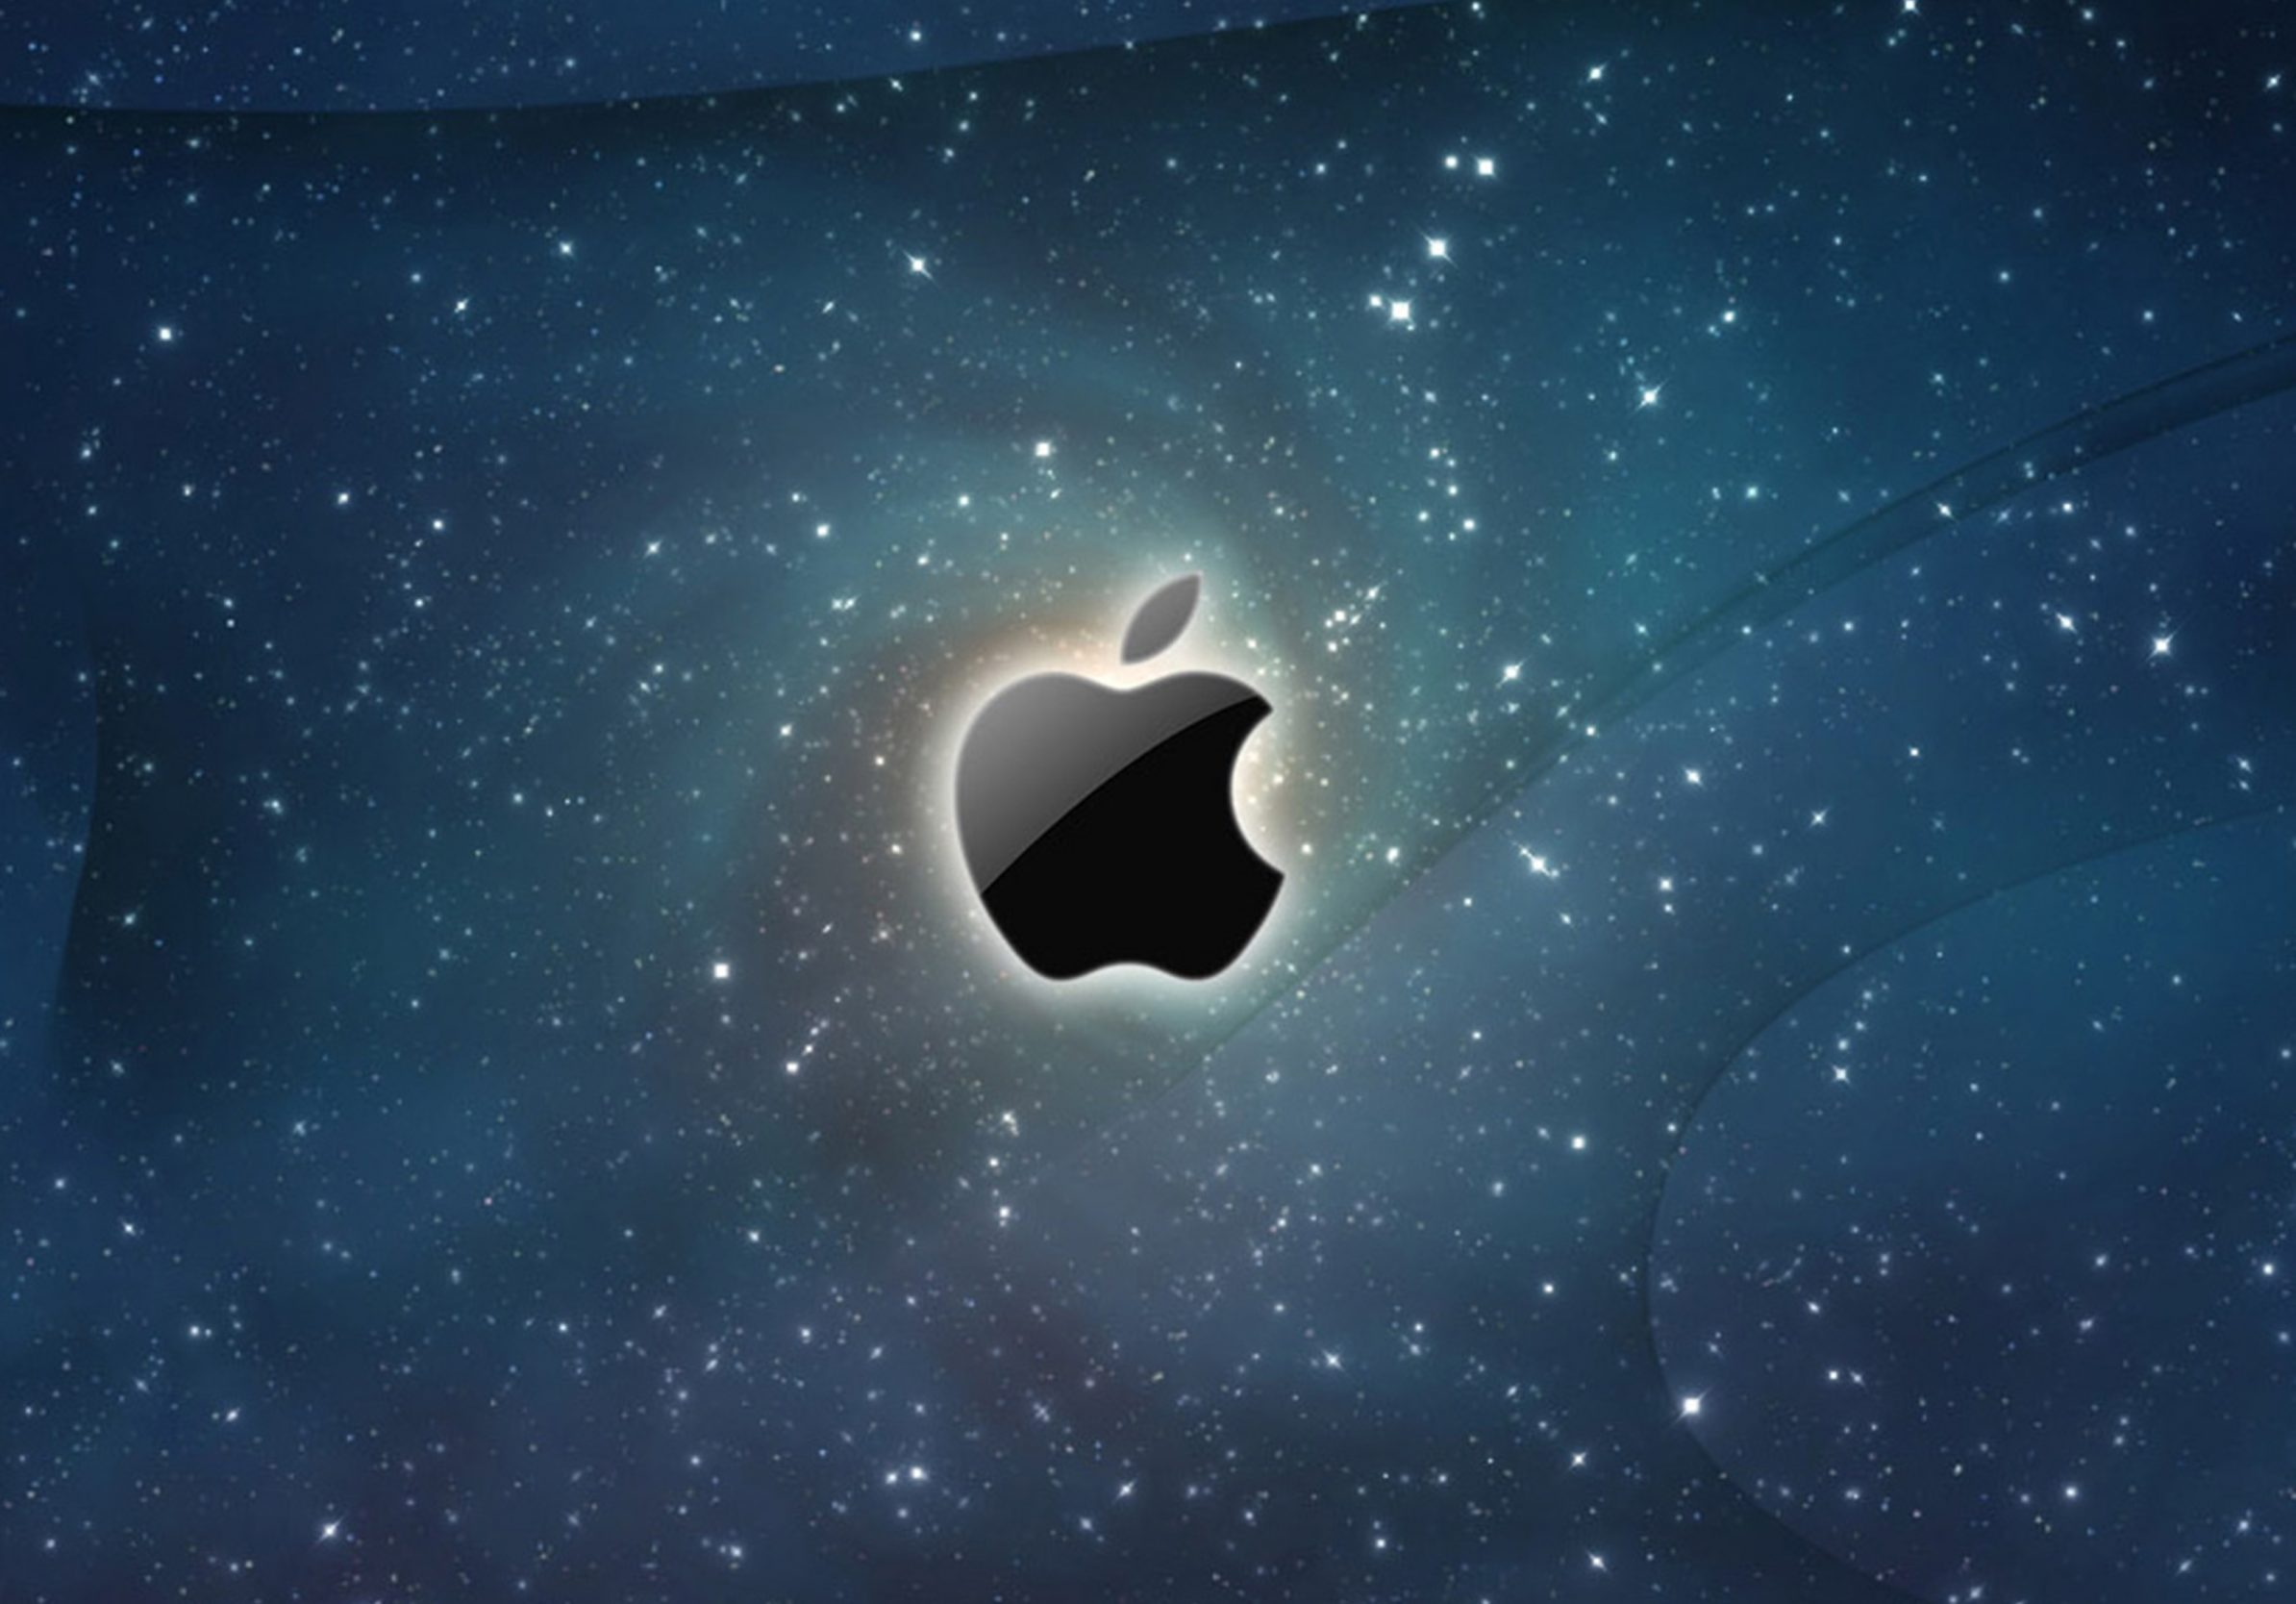 2388x1668 iPad Pro wallpapers Apple Space Ipad Wallpaper 2388x1668 pixels resolution